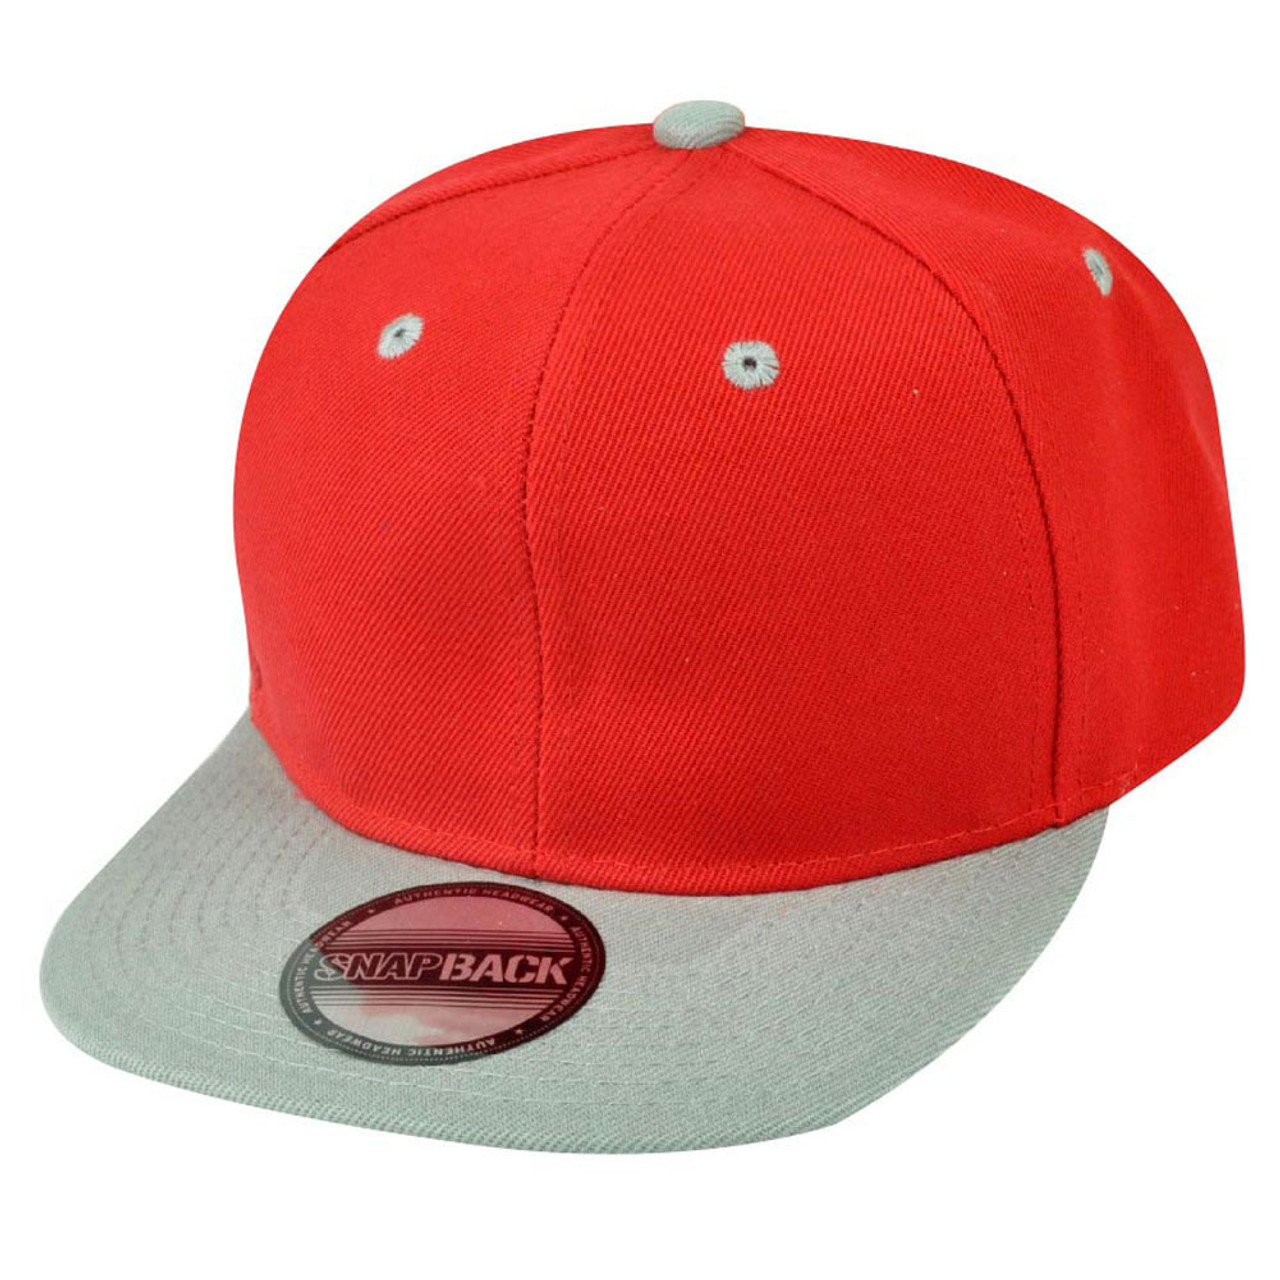 d4ead1cc Blank Plain Two Tone Red Grey Adjustable Snapback Flat Bill Acrylic Hat Cap  - Cap Store Online.com